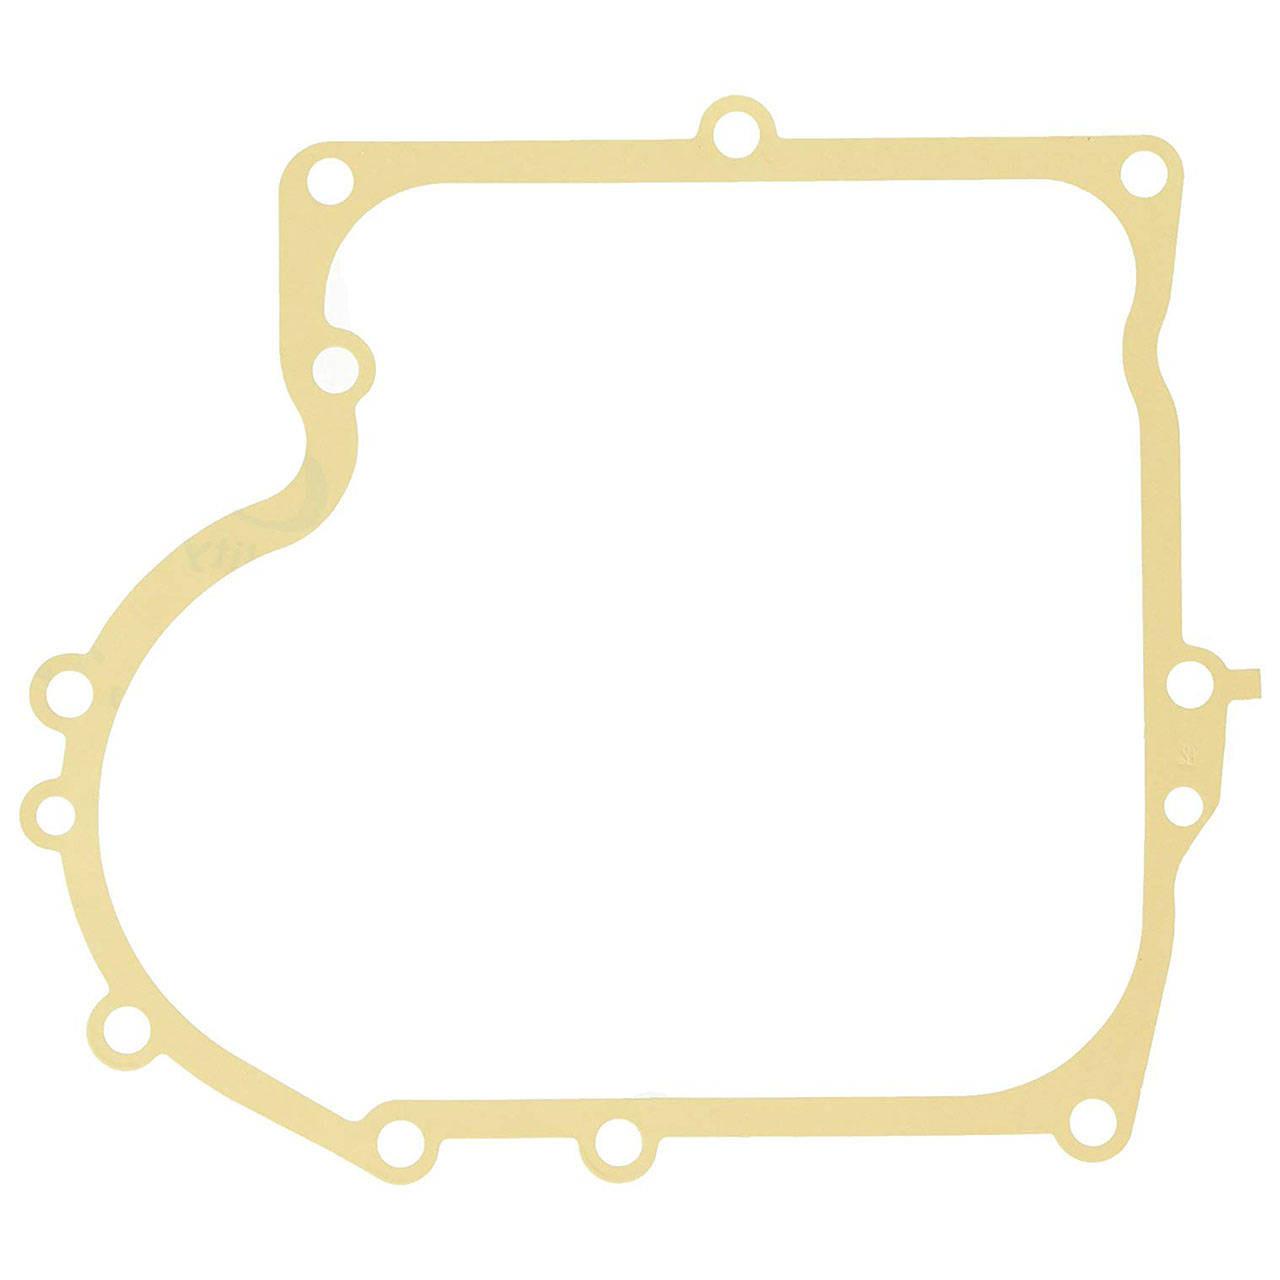 Genuine OEM Briggs /& Stratton GASKET-CRKCSE//005 Part# 270125